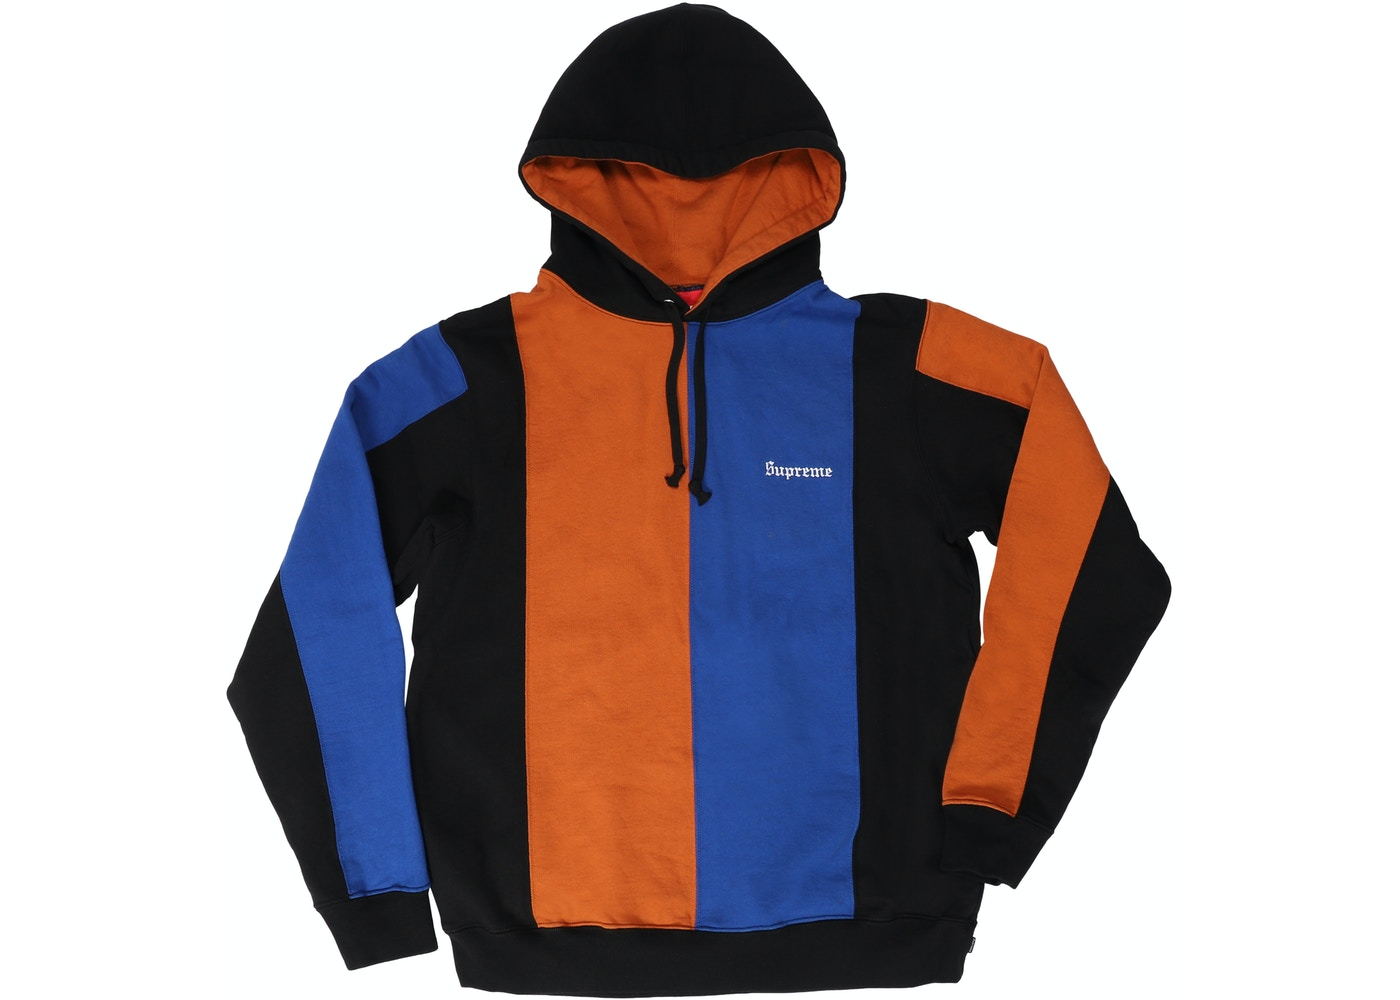 5dc23e94d53 Supreme Tricolor Hooded Sweatshirt Black - FW18